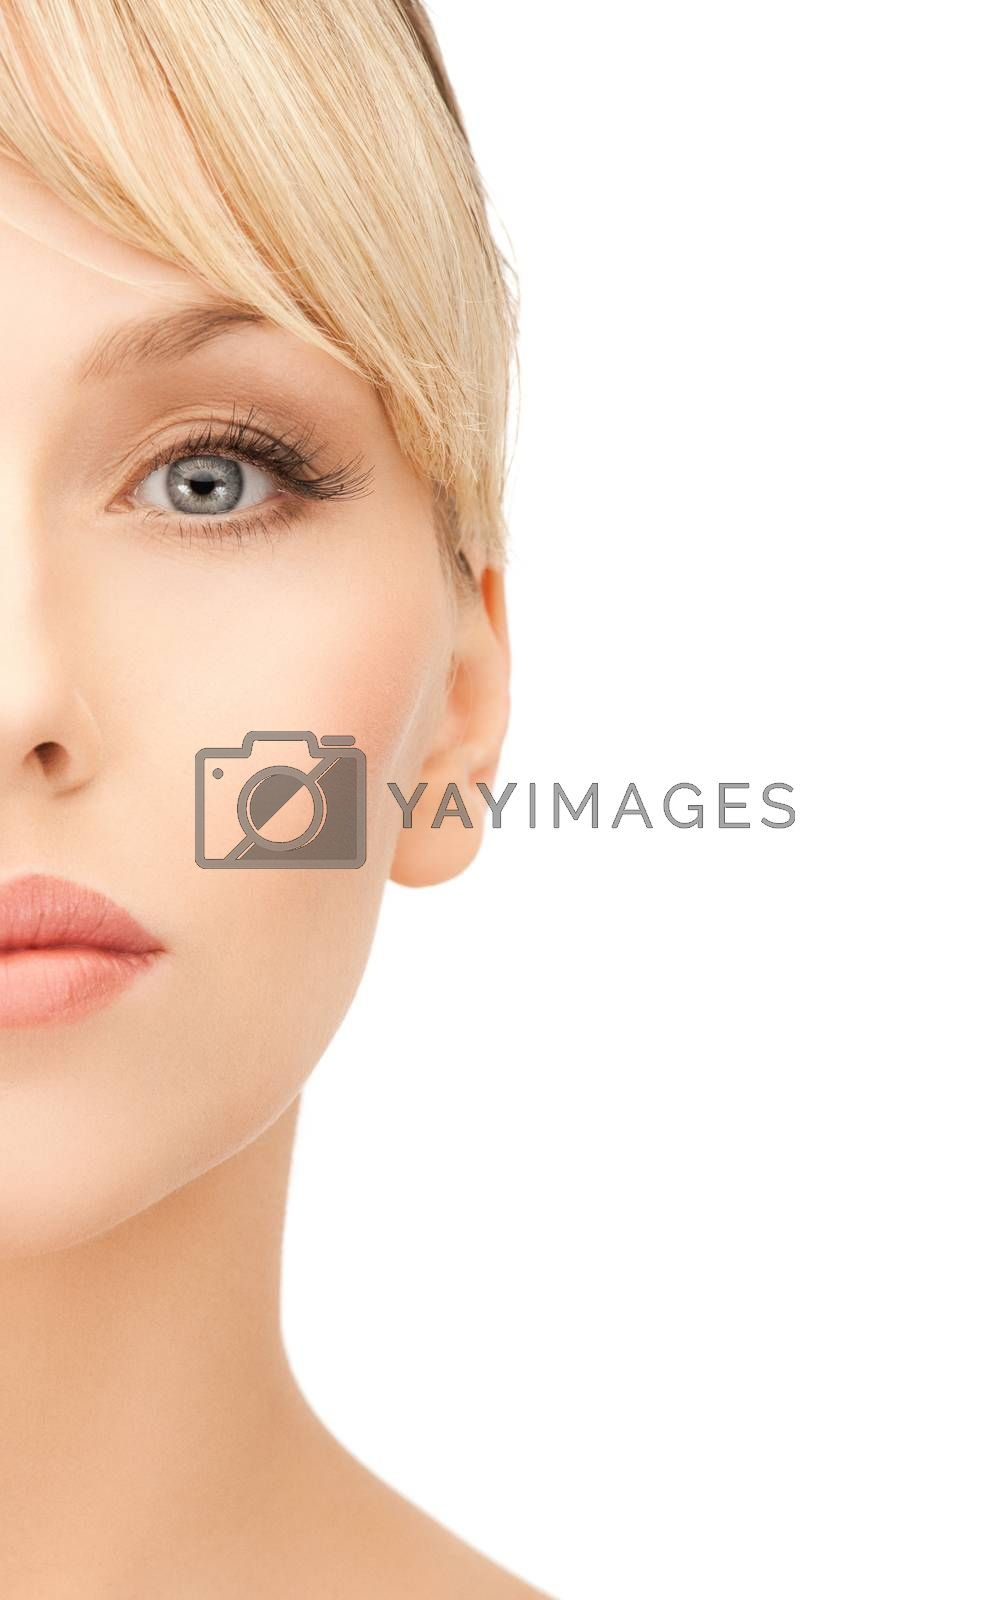 beautiful woman with blonde hair by dolgachov